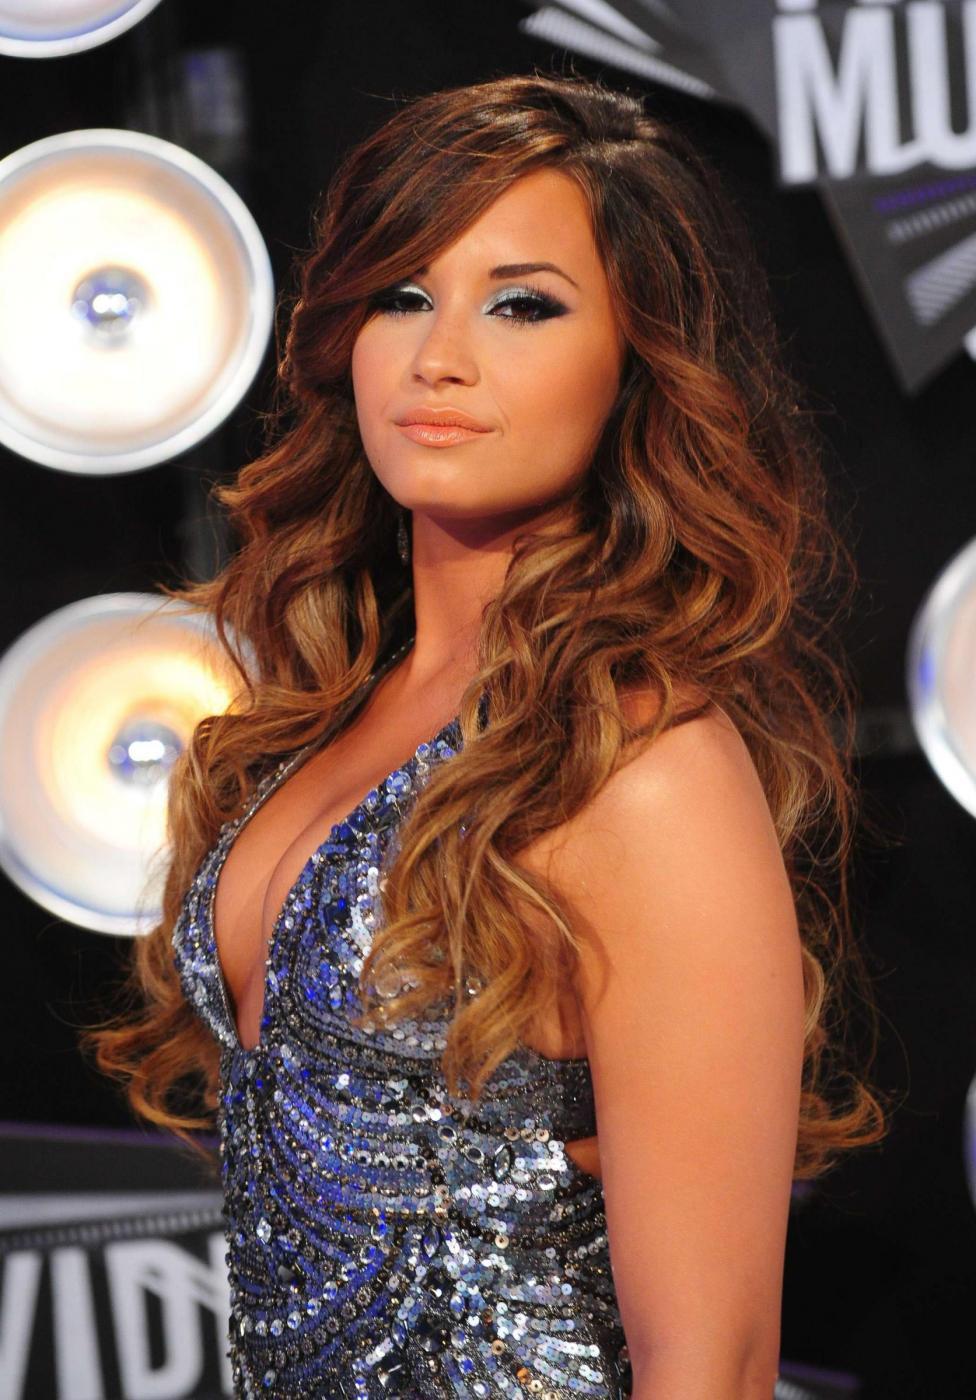 Resultado de imagem para VMA 2011 demi lovato